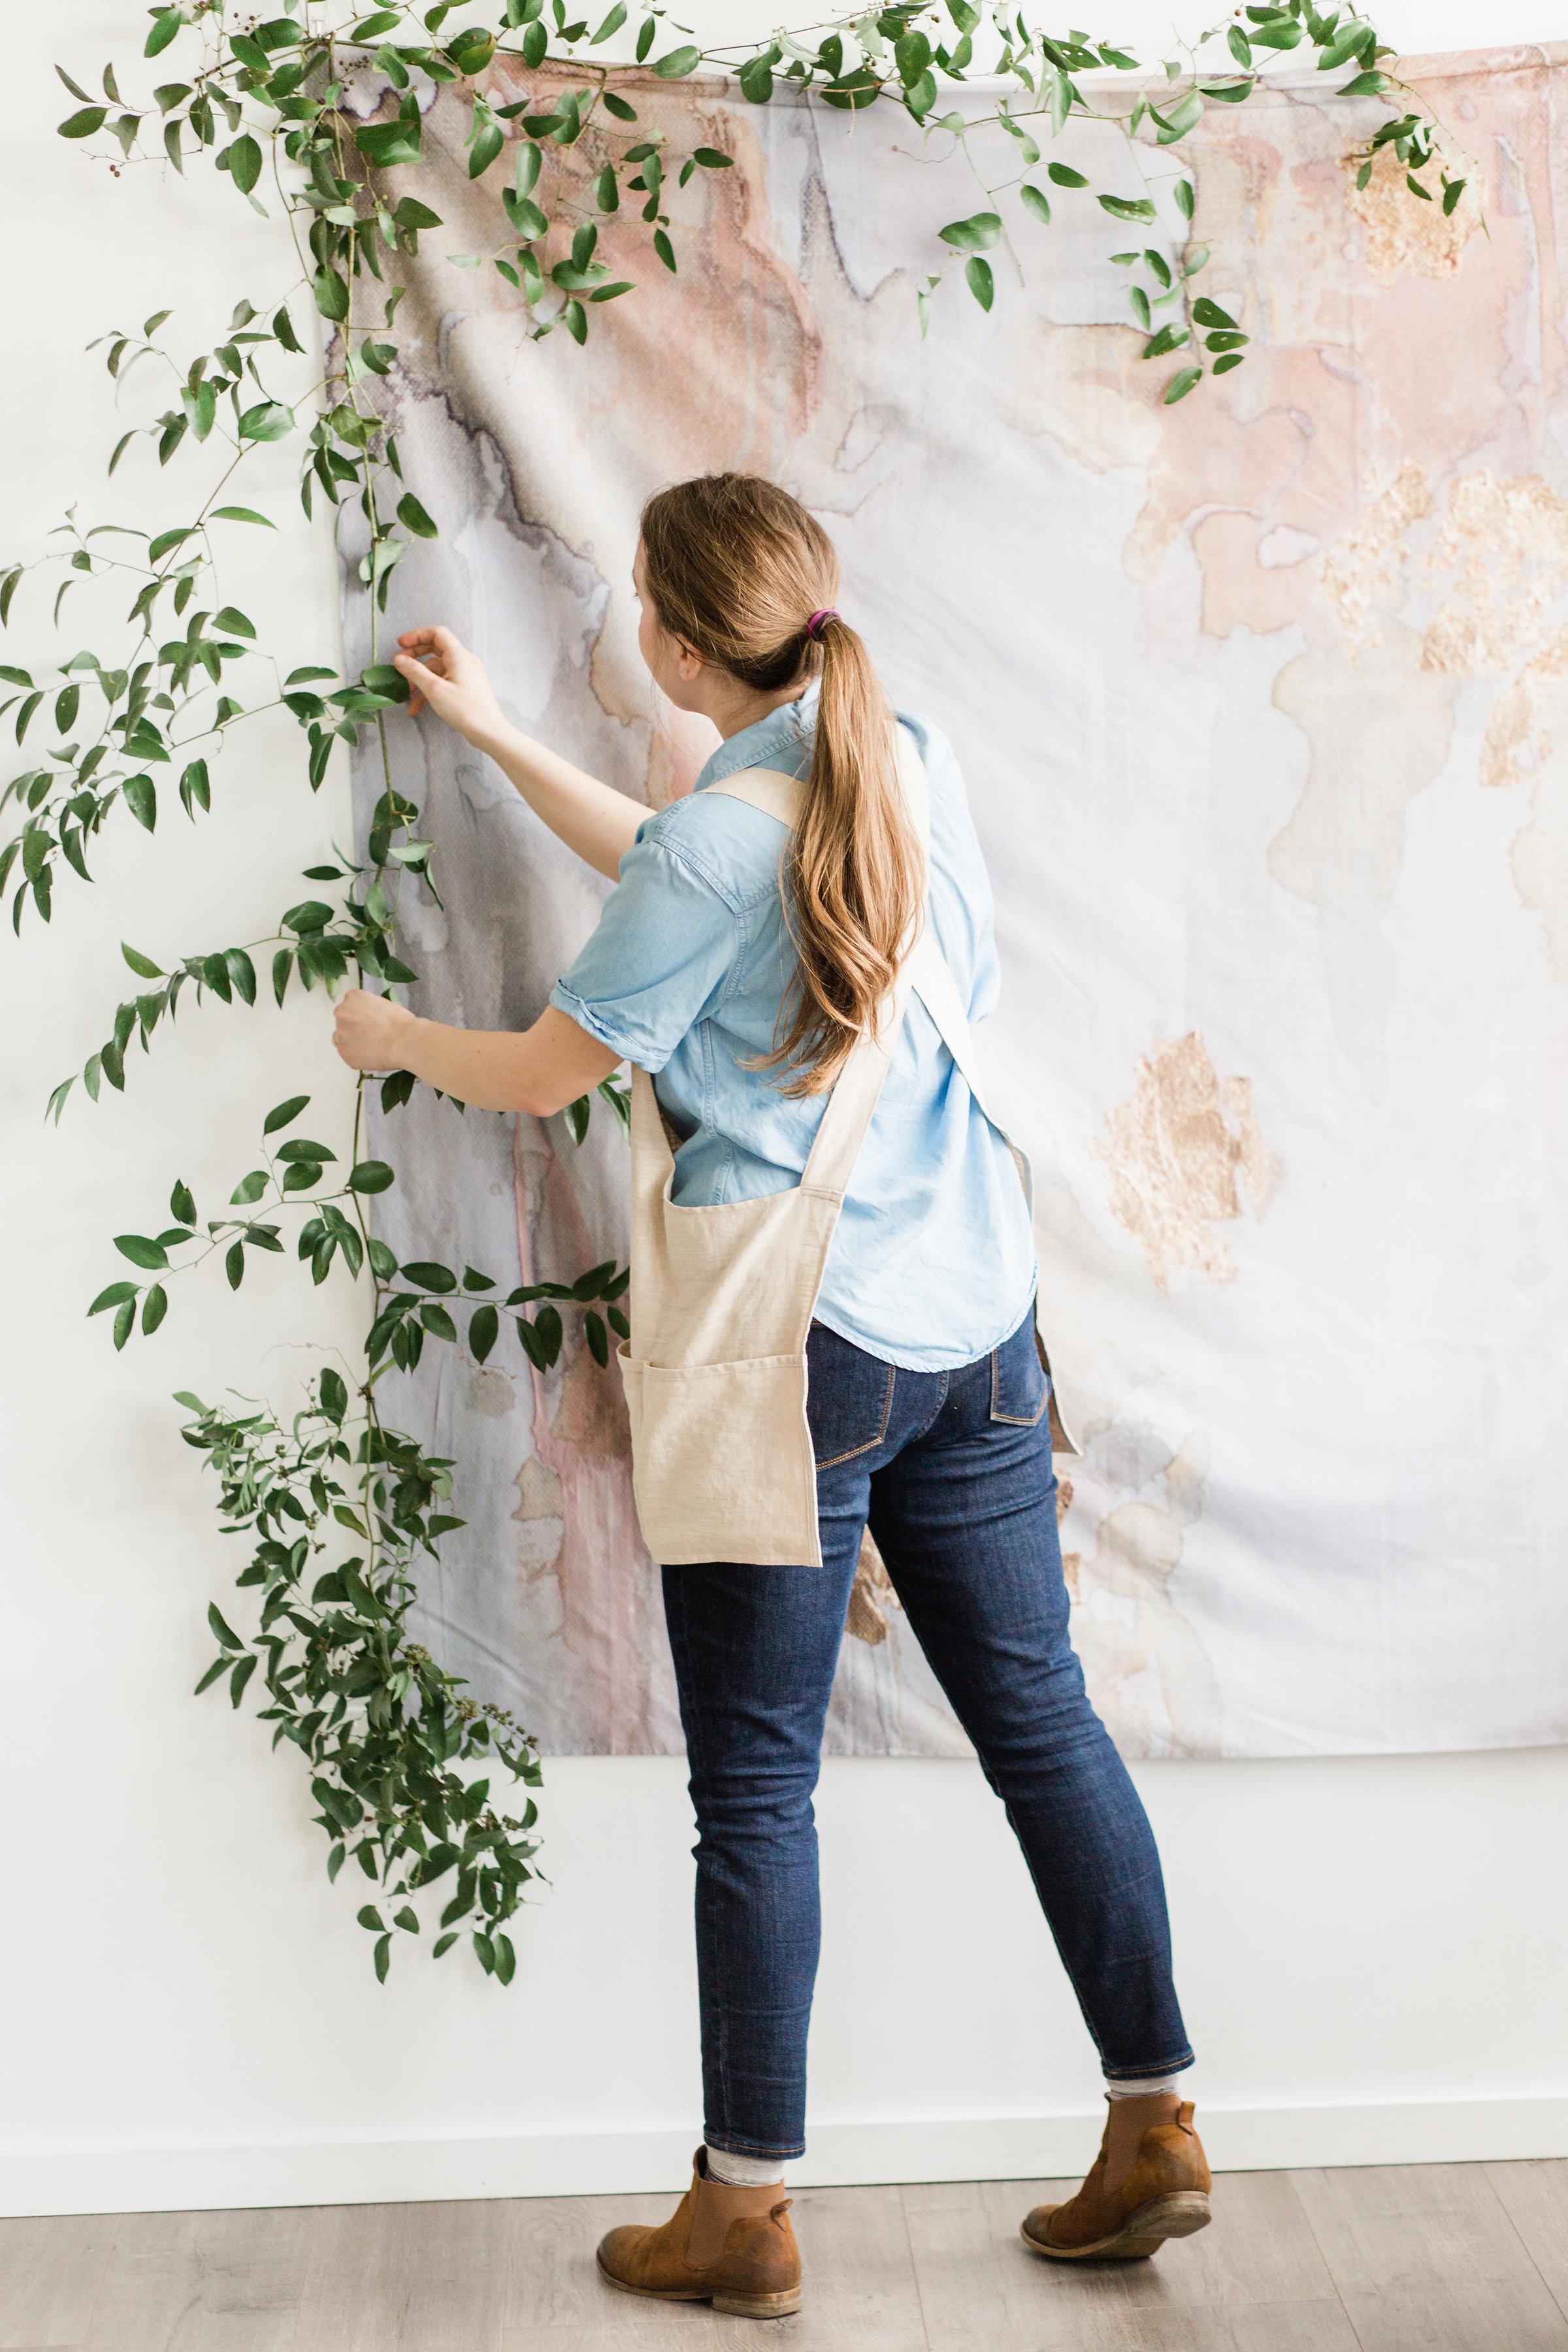 foraged home 100% linen cross back apron in natural beige color